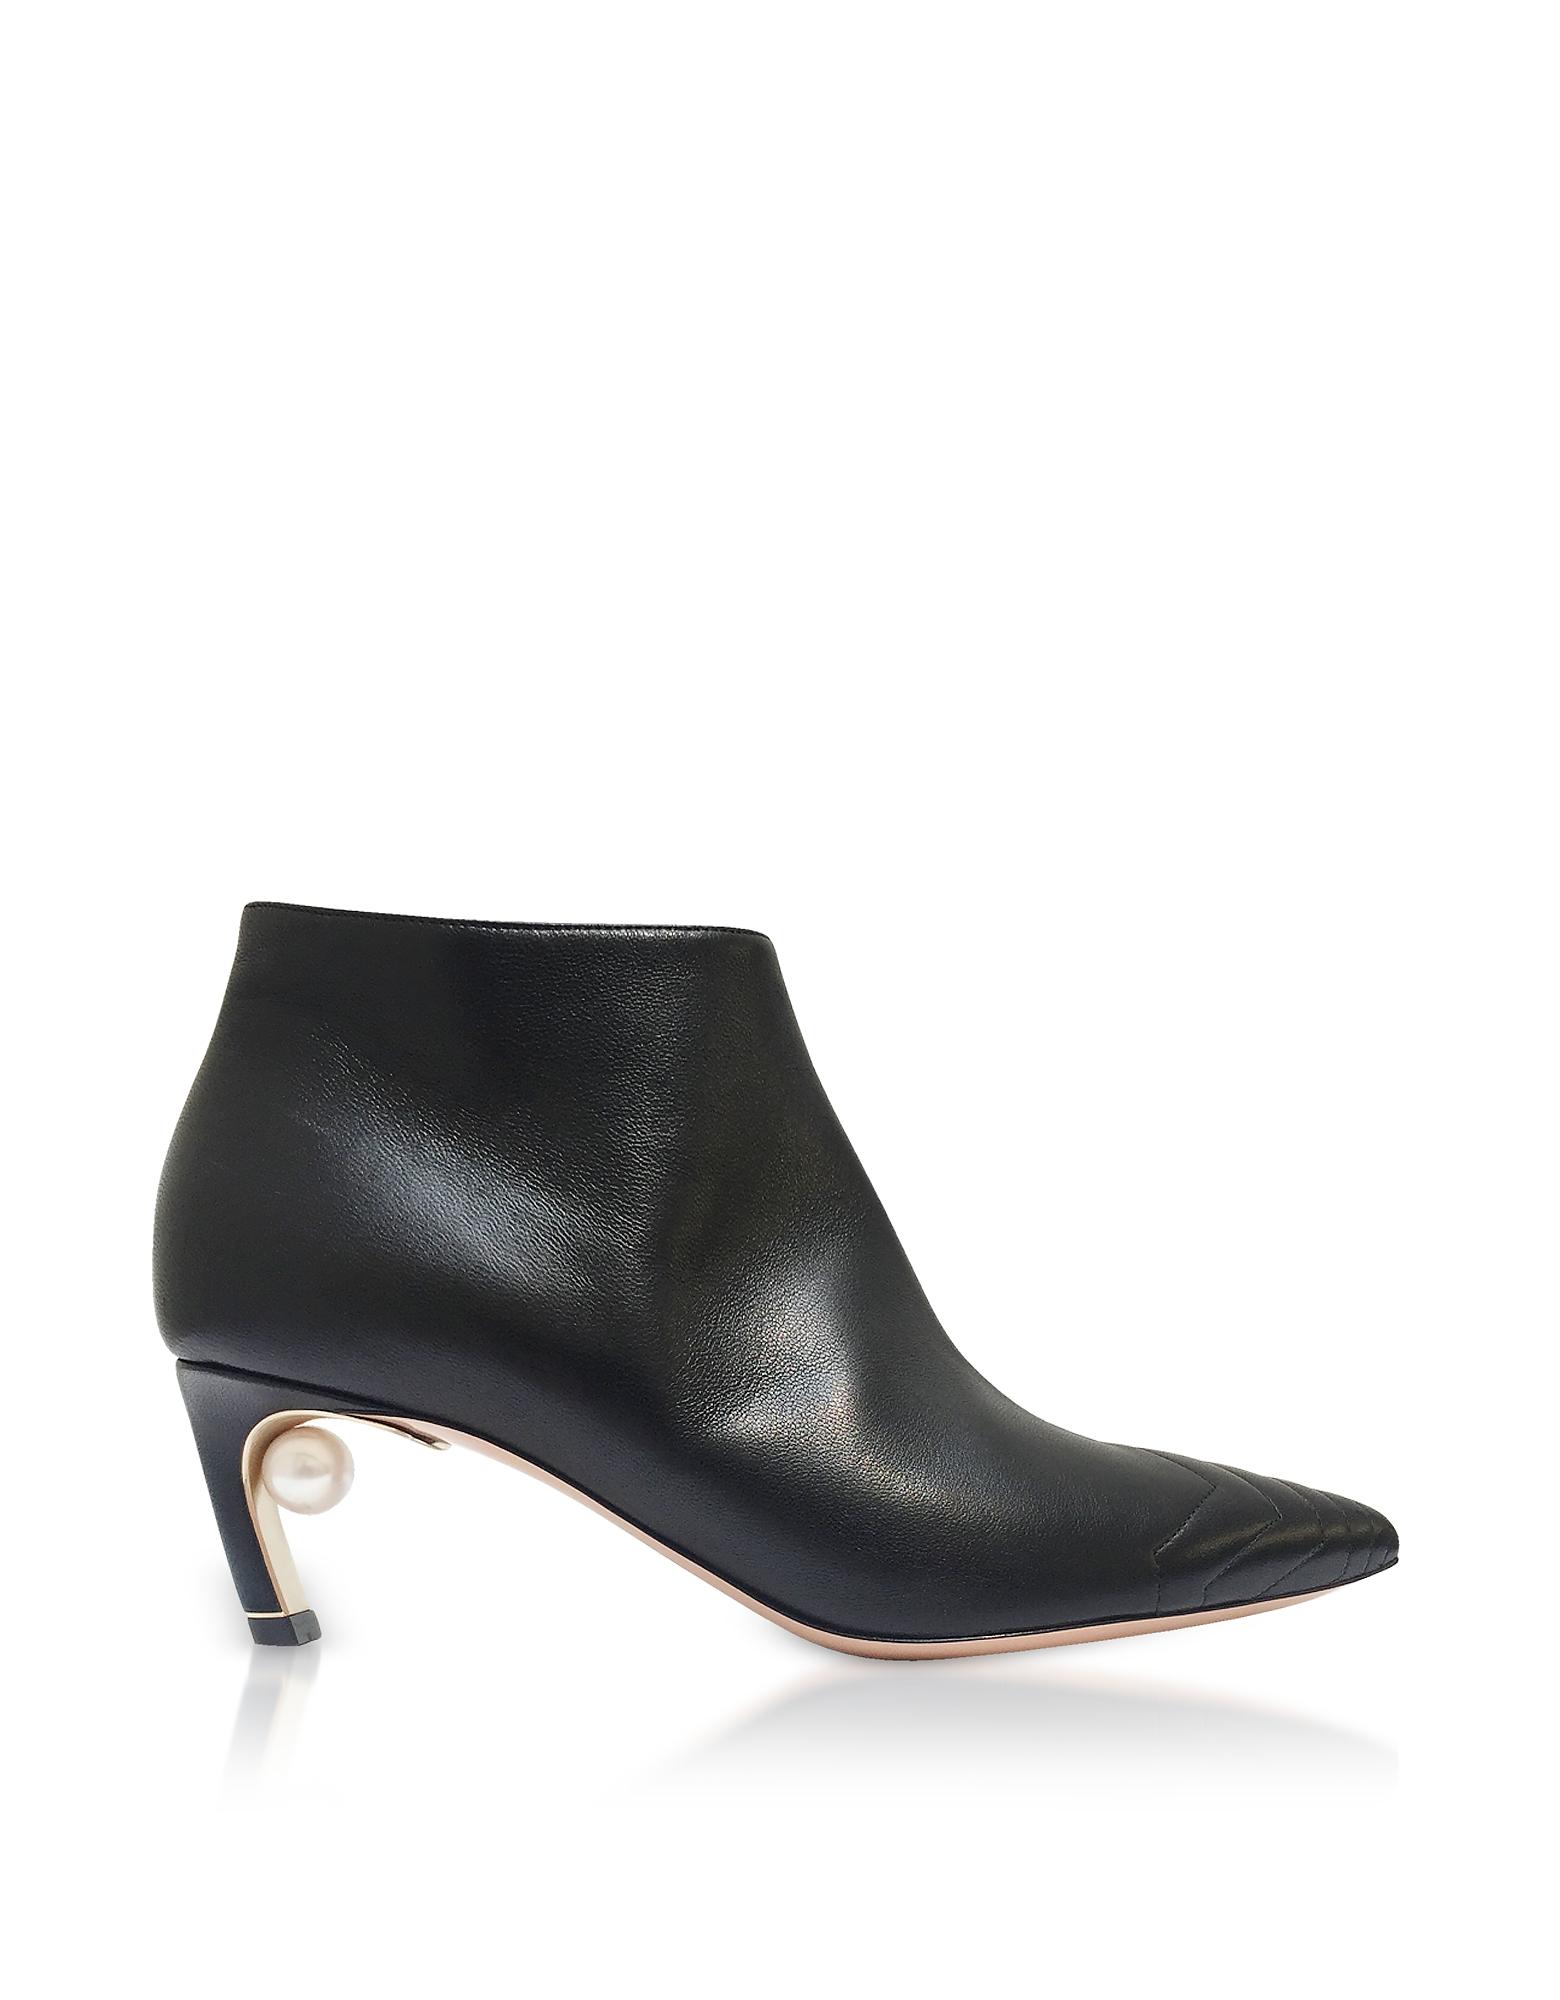 Nicholas Kirkwood Shoes, Black Quilted Nappa 55mm Mira Pearl Low Booties